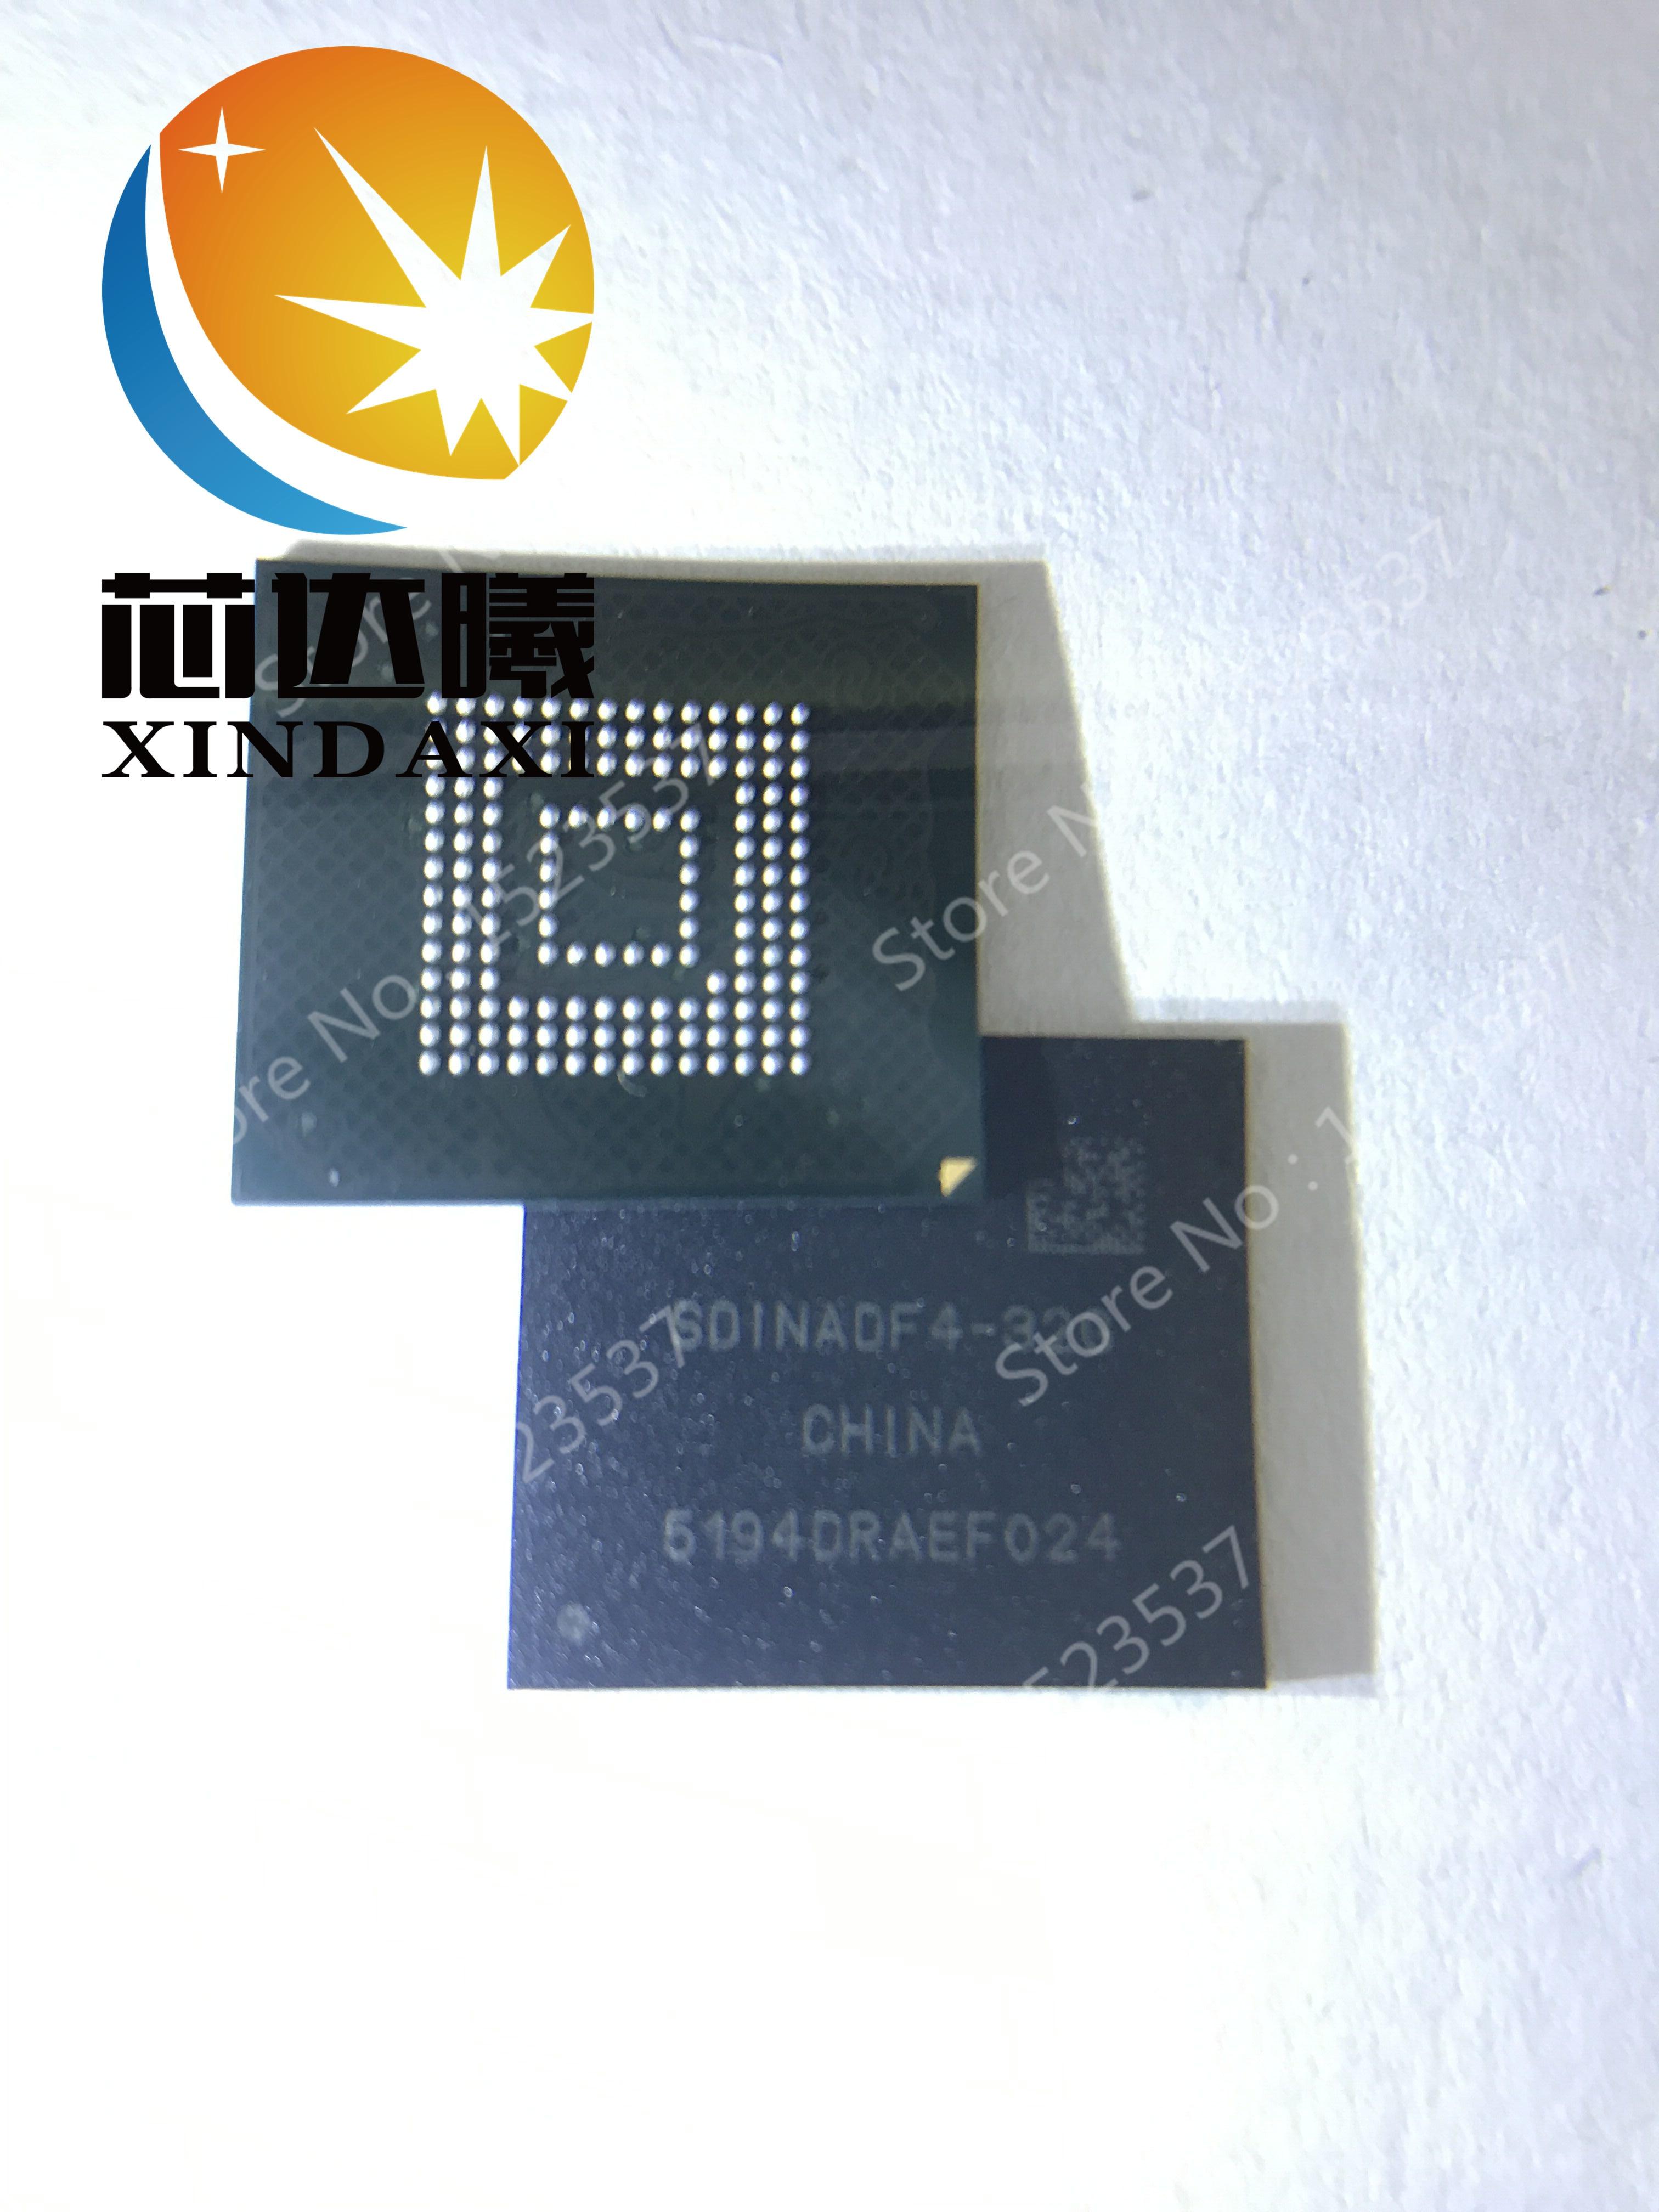 XINDAXI SDINADF4-32G BGA153 EMMC 5.1 32GB CHIP IC more discounts for more models please contact us